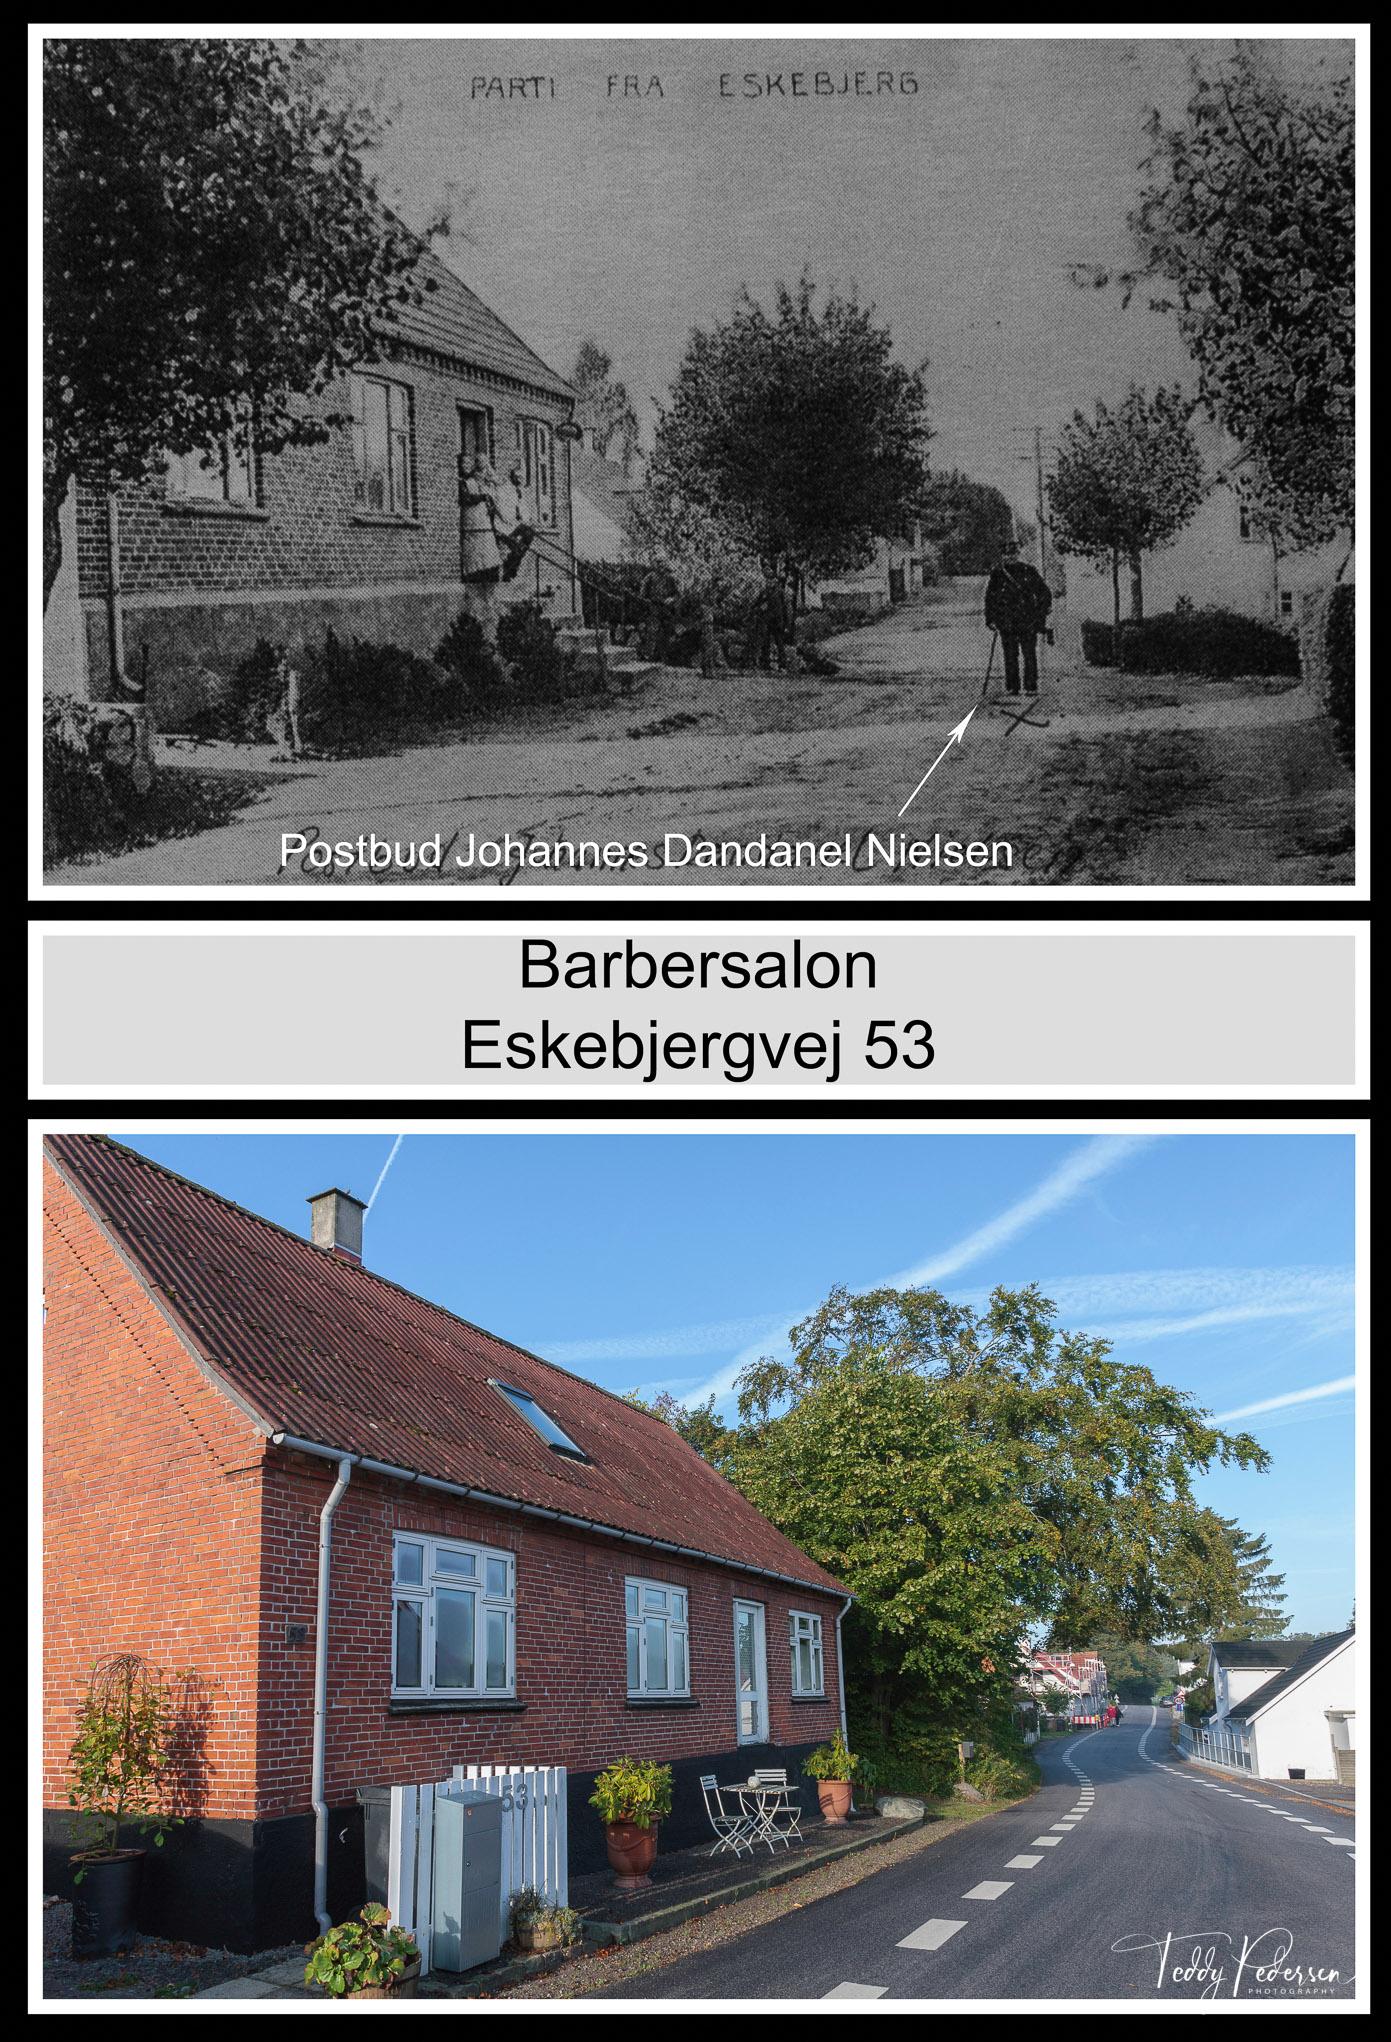 012-042-Barbersalon-Eskebjergvej-53_HighRes_LowRes